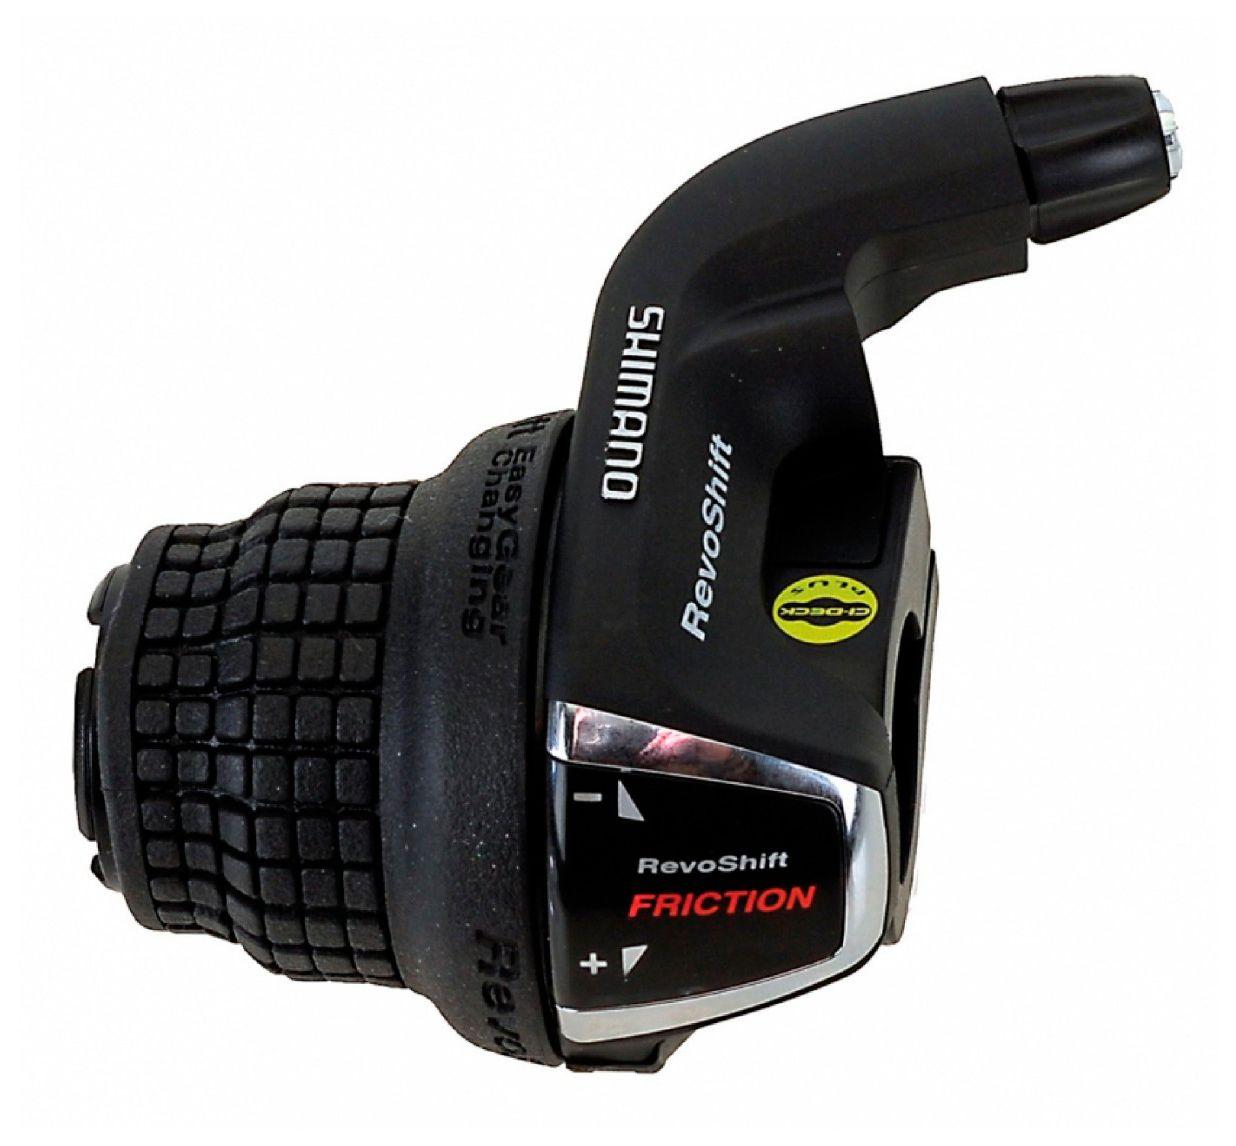 Запчасть Shimano Tourney RS35, лев, 3(Frict)ск. shimano tourney rs47